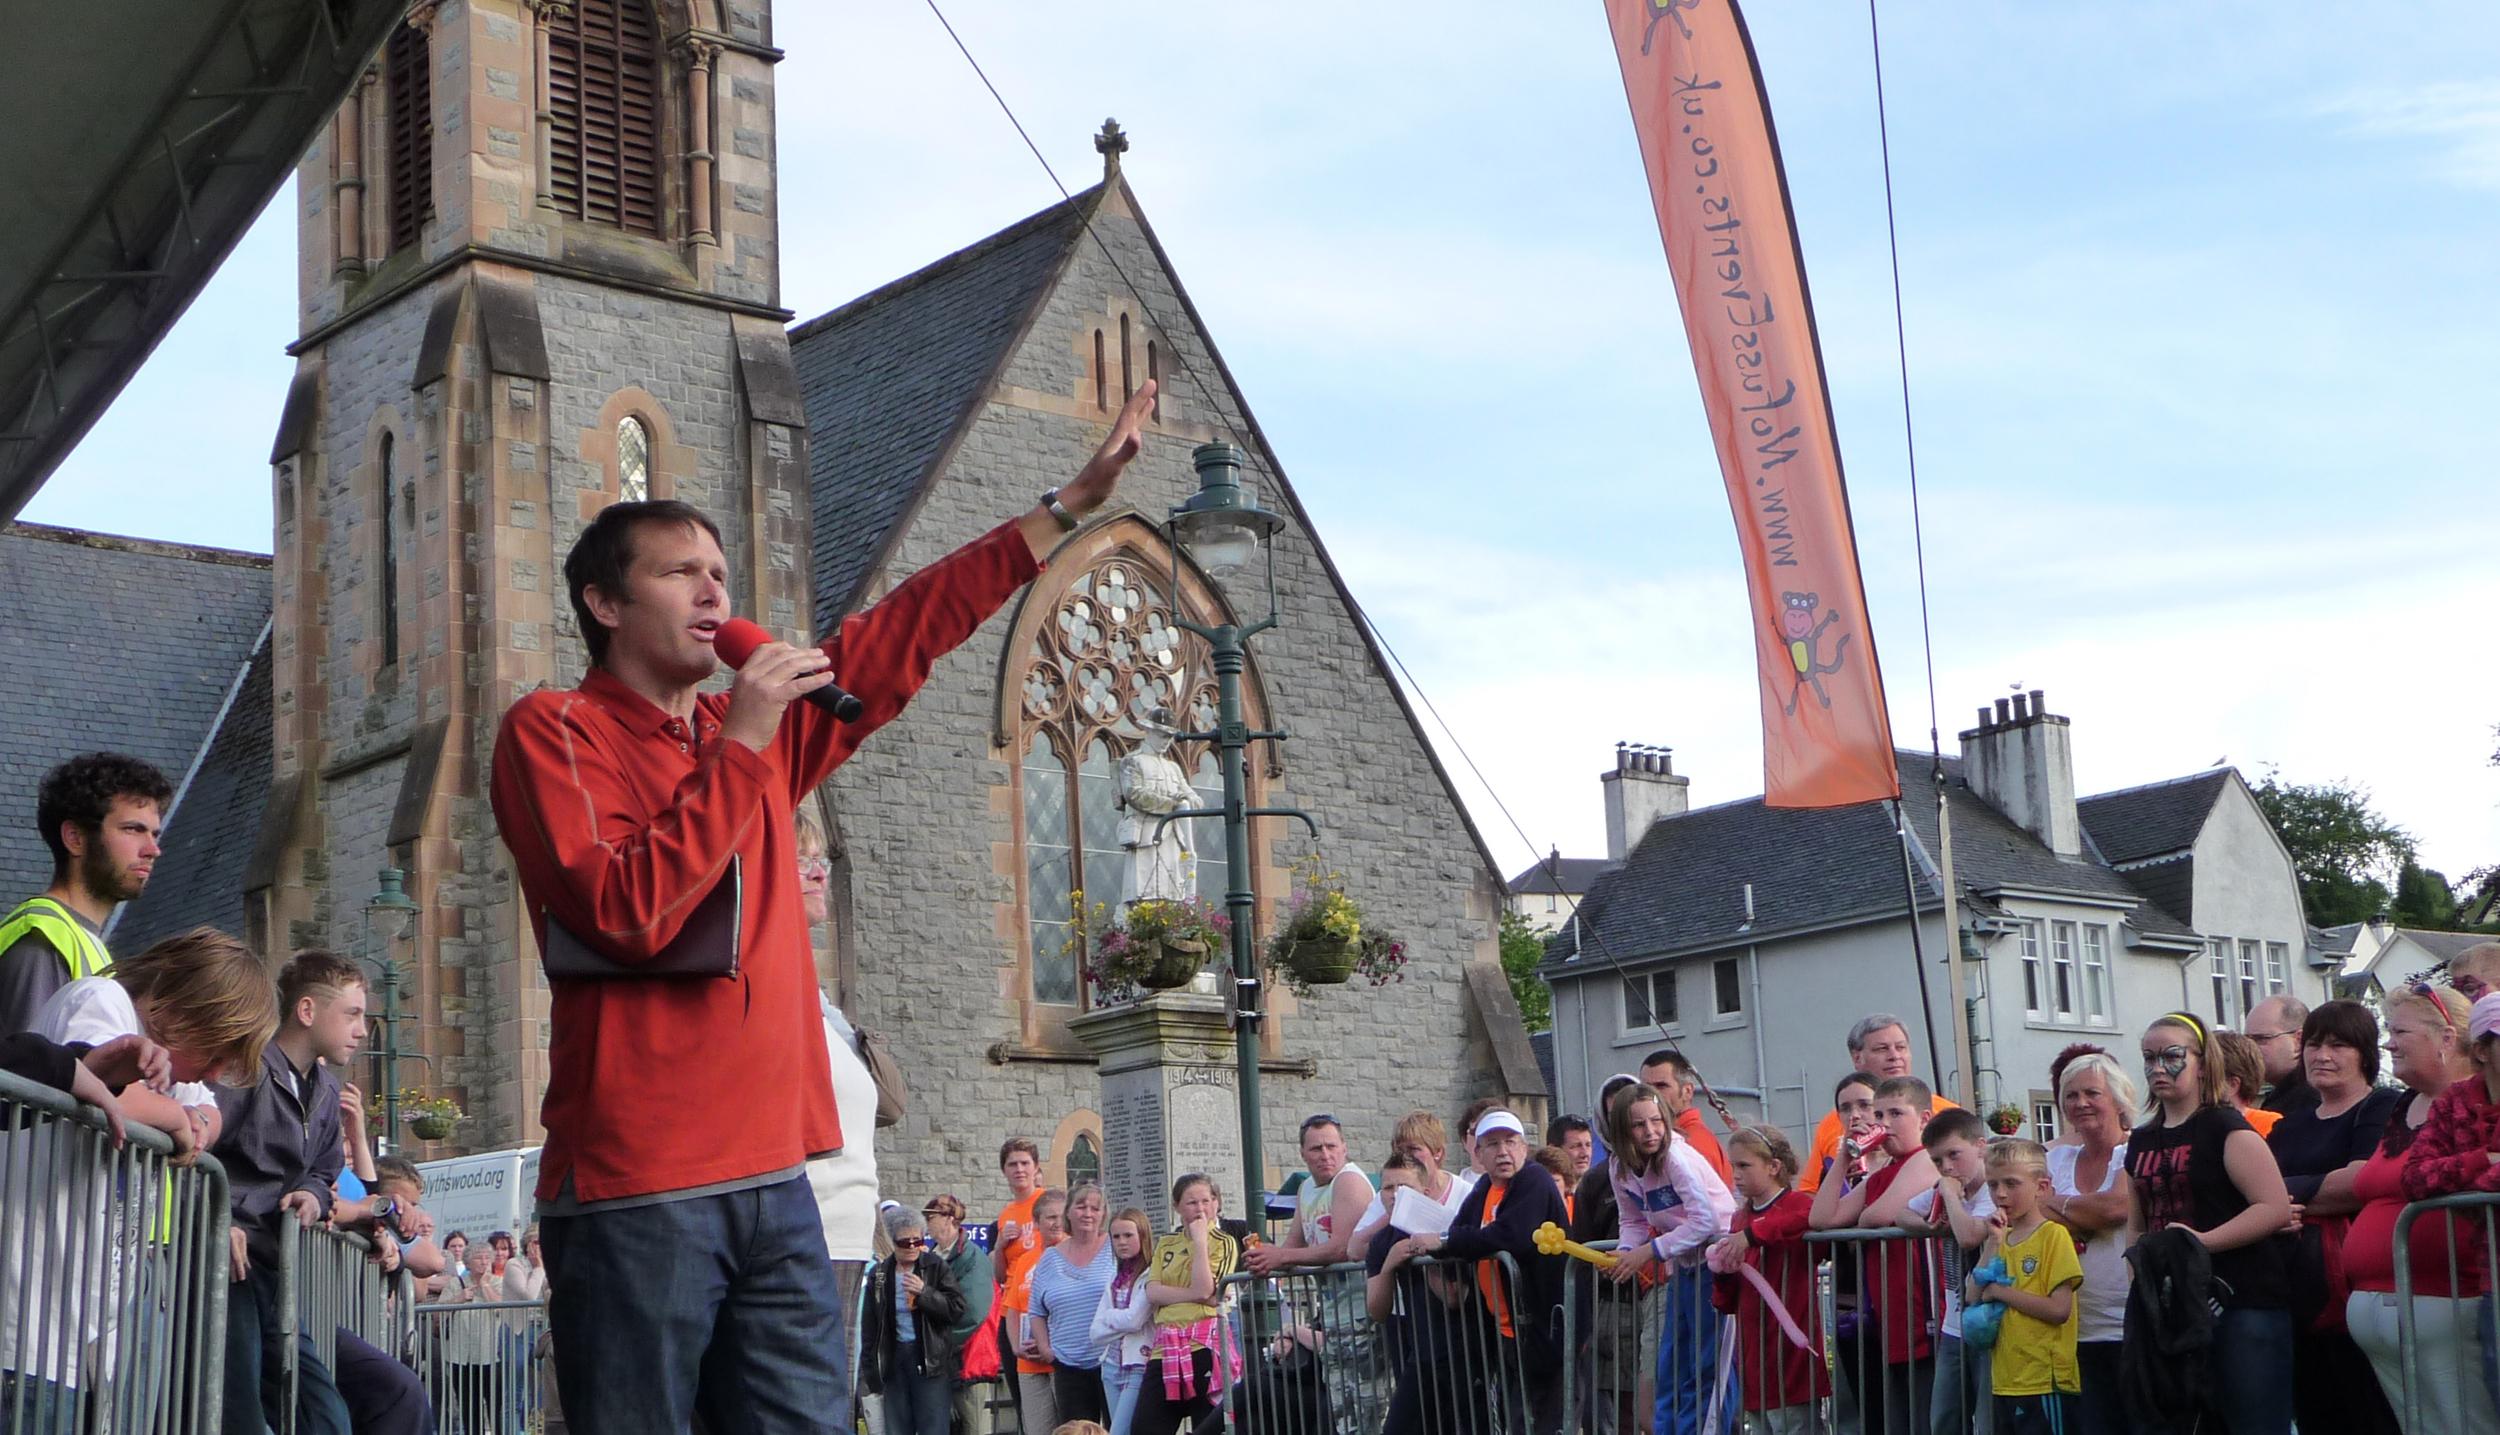 Andrew Speaking in Scotland Before the Festival, 2009